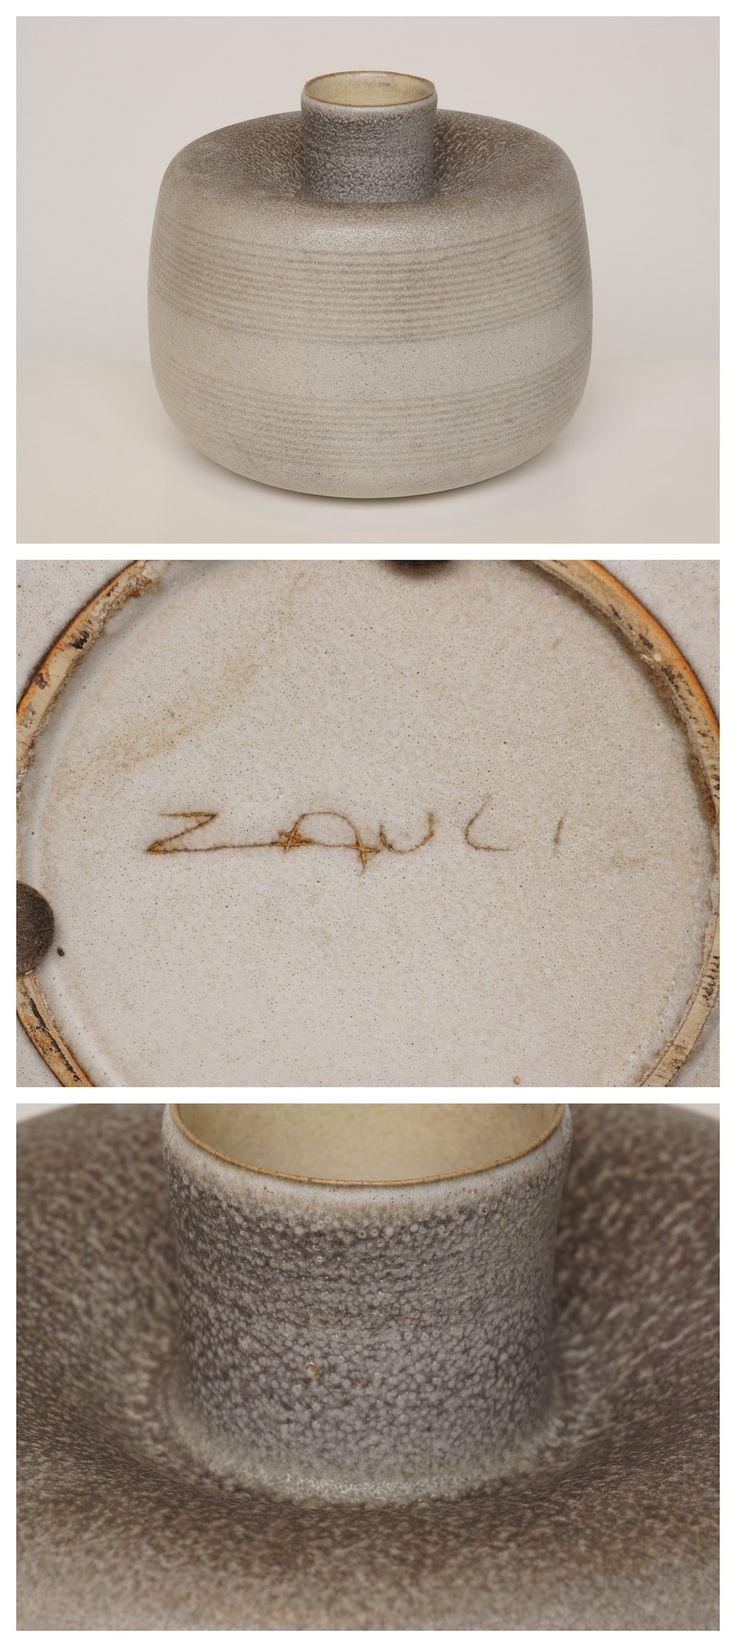 Carlo Zauli Ceramic Vase, signed, Italian, c.1960. _ #1960s #CarloZauli